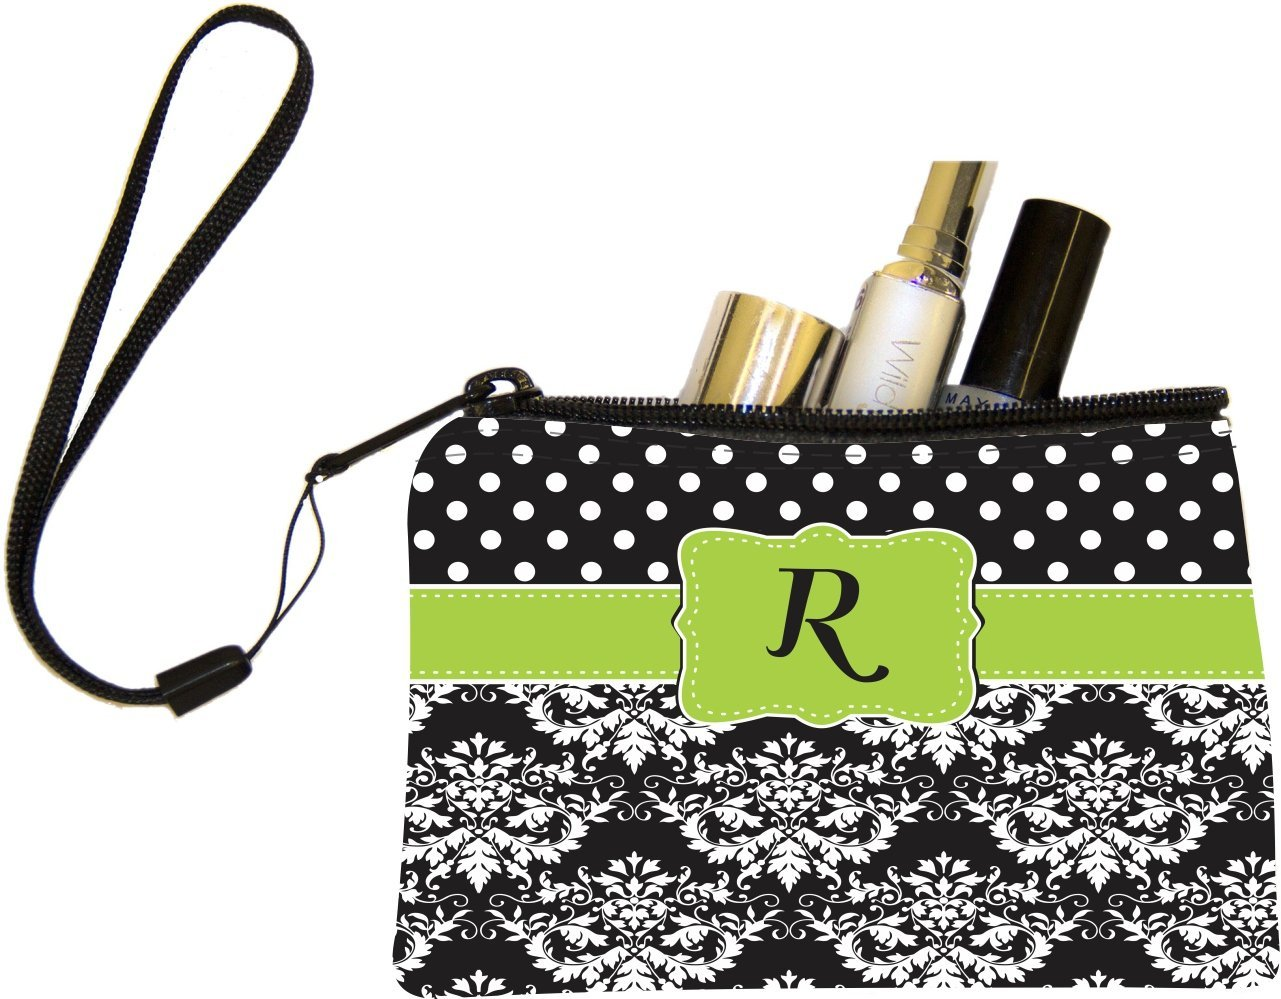 Rikki Knight InitialR Lime Green Black Damask Dots Design Messenger School Bag mbcp-cond44512